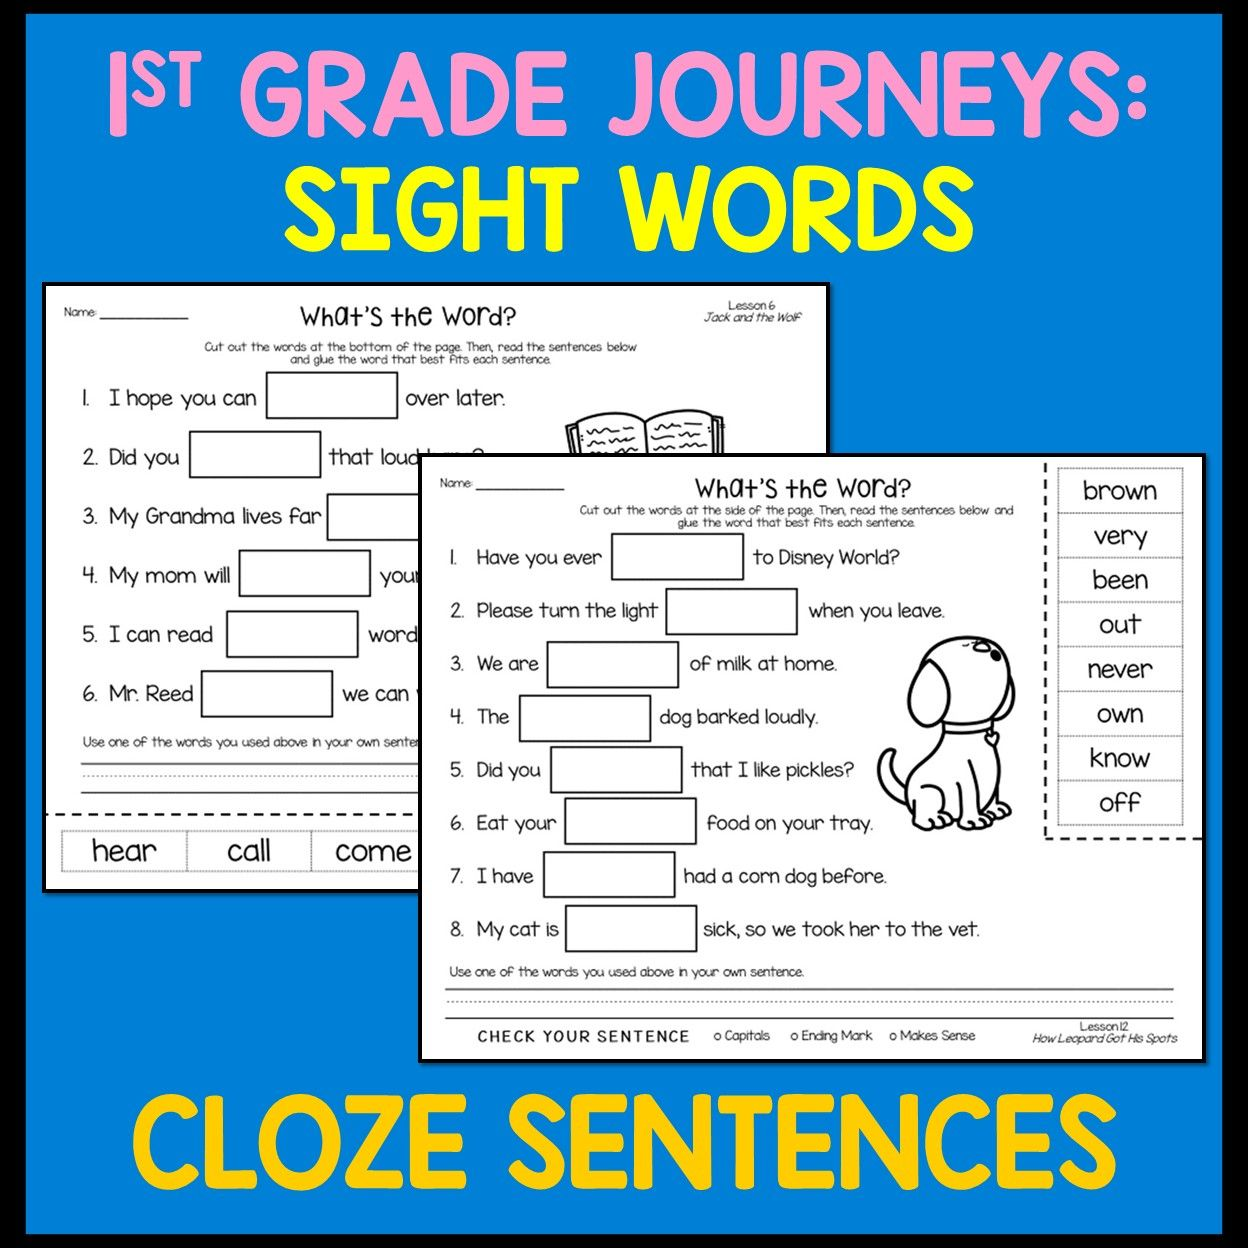 Journeys Sight Words Cloze Sentences